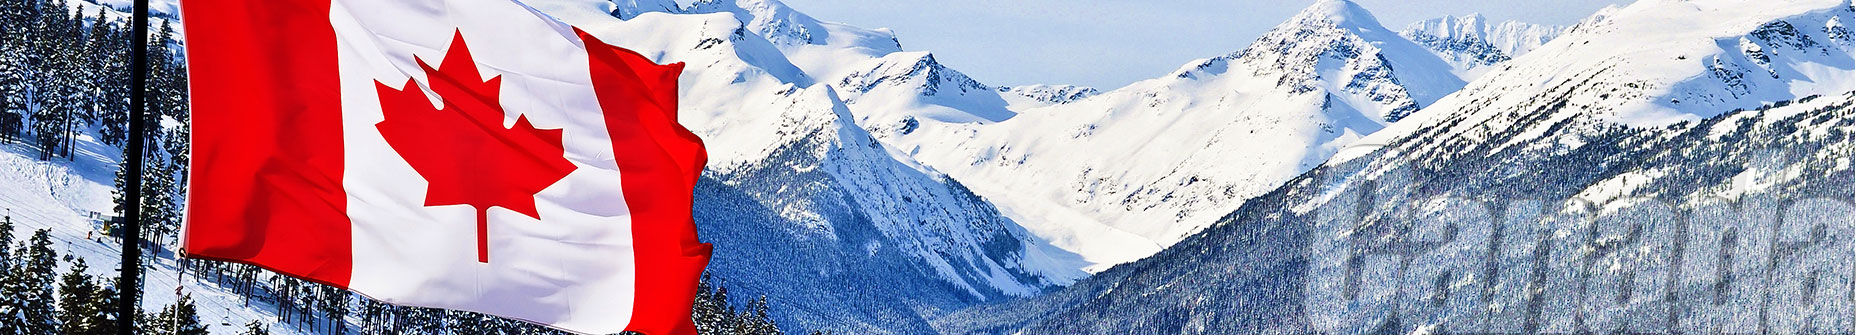 canada-panoramatop.jpg